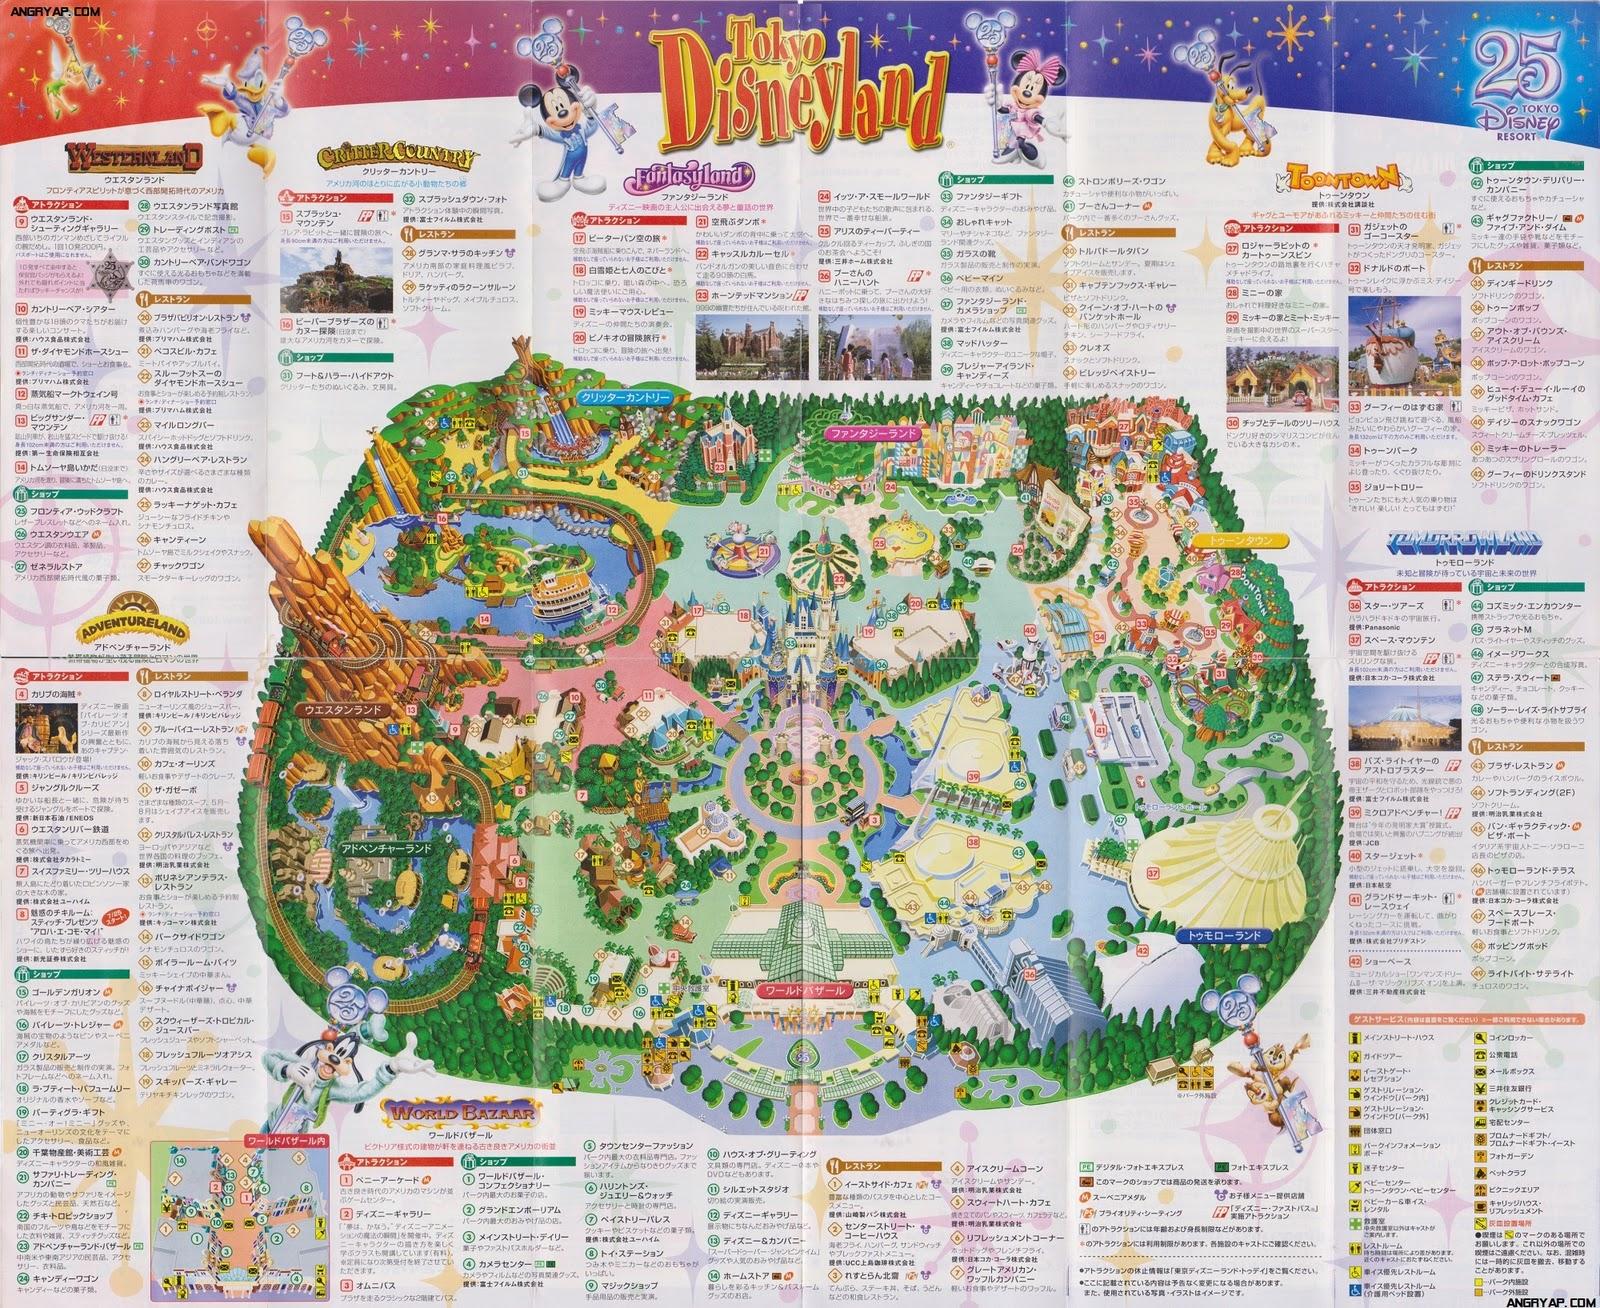 http://2.bp.blogspot.com/-sRKDRwdIDUg/TpIDbDFK4gI/AAAAAAAAAjM/Dt1F46M7Vrw/s1600/tokyodisneyland08map.jpg